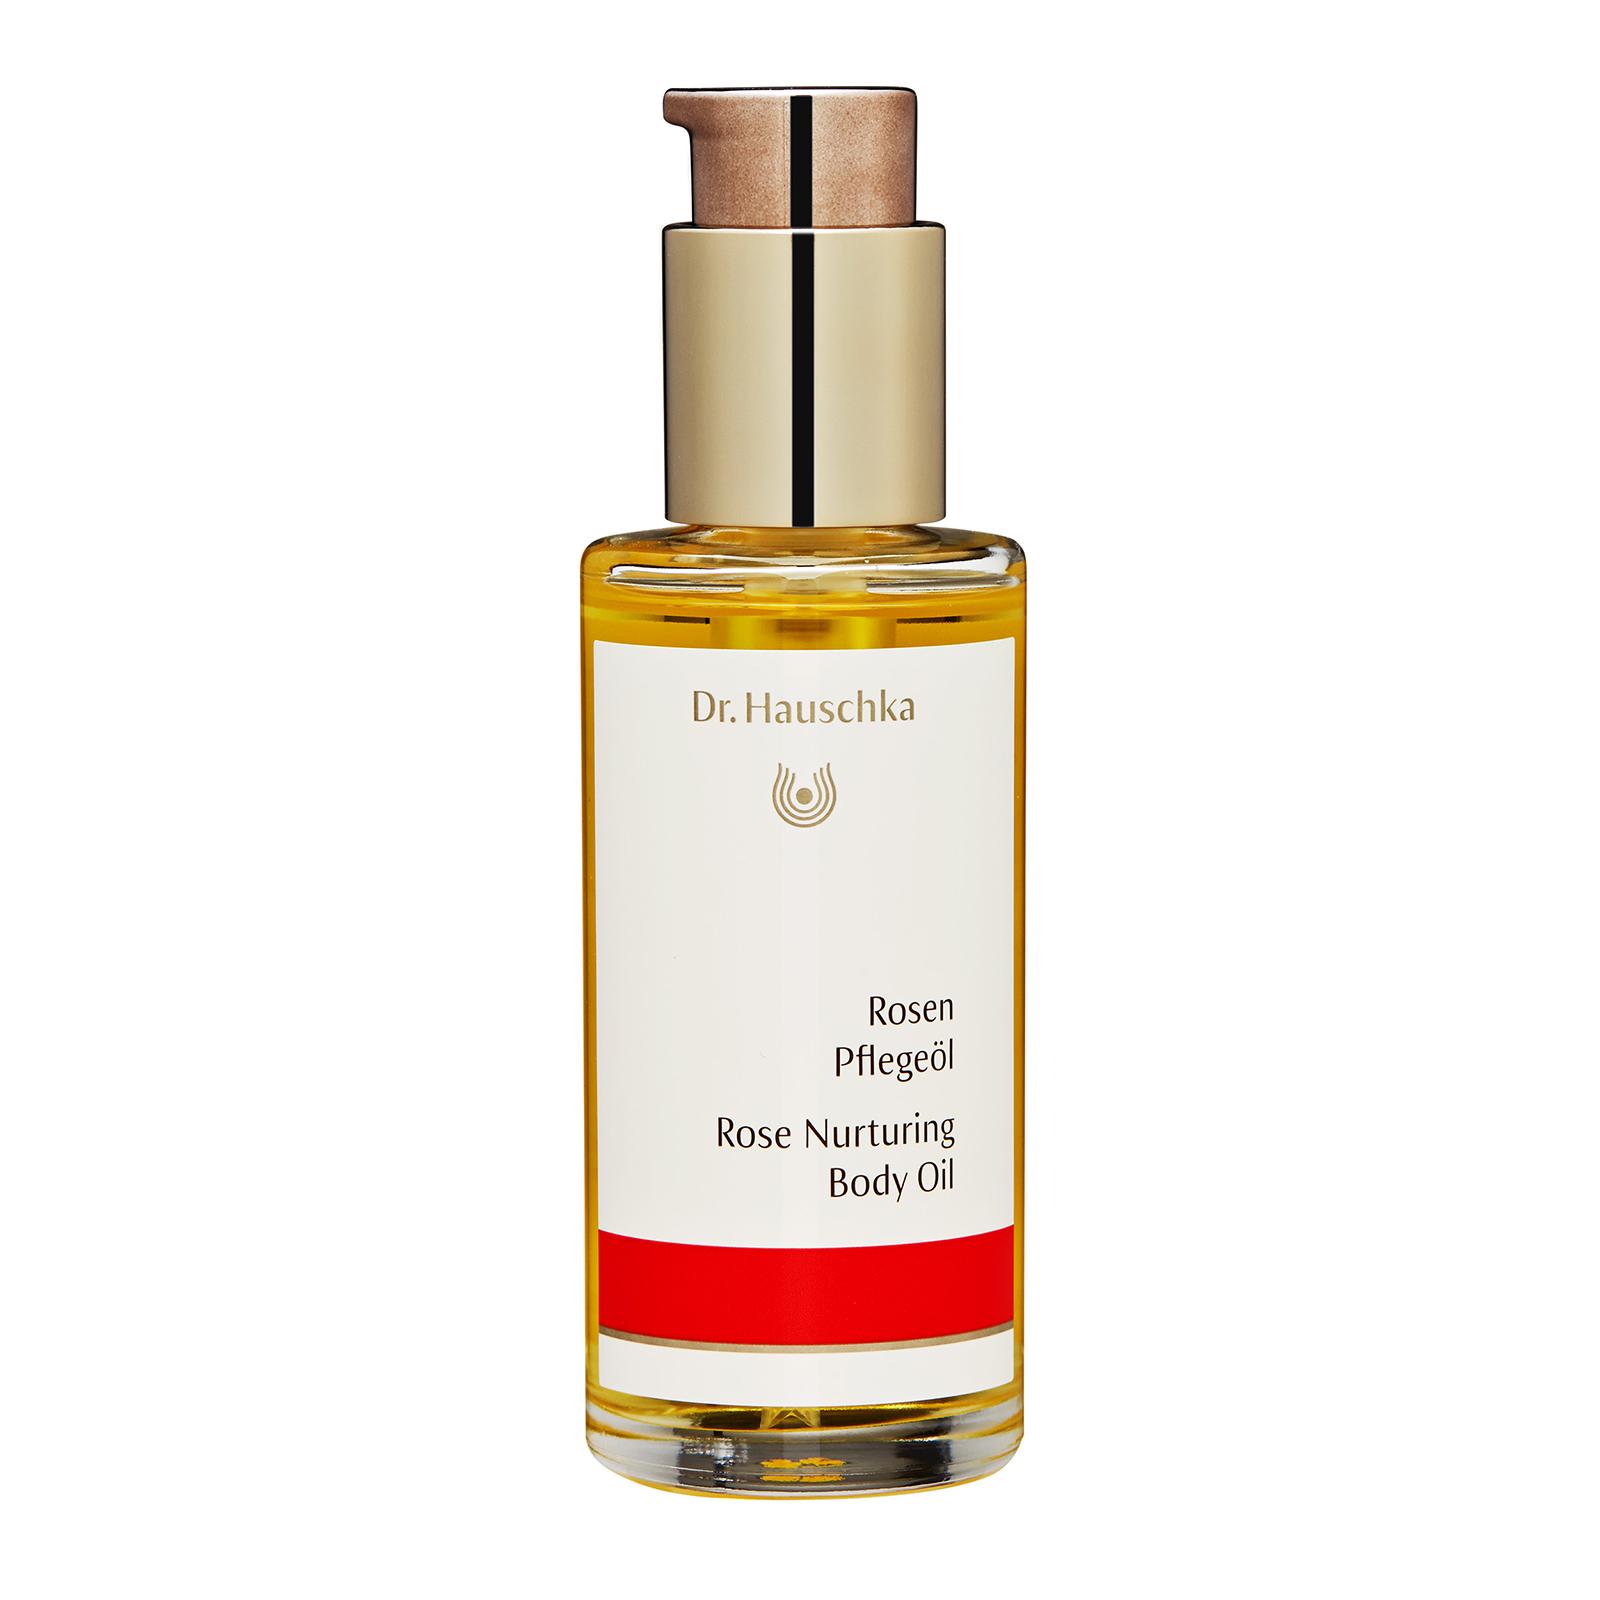 Dr. Hauschka  Rose Nurturing Body Oil 75ml, from Cosme-De.com